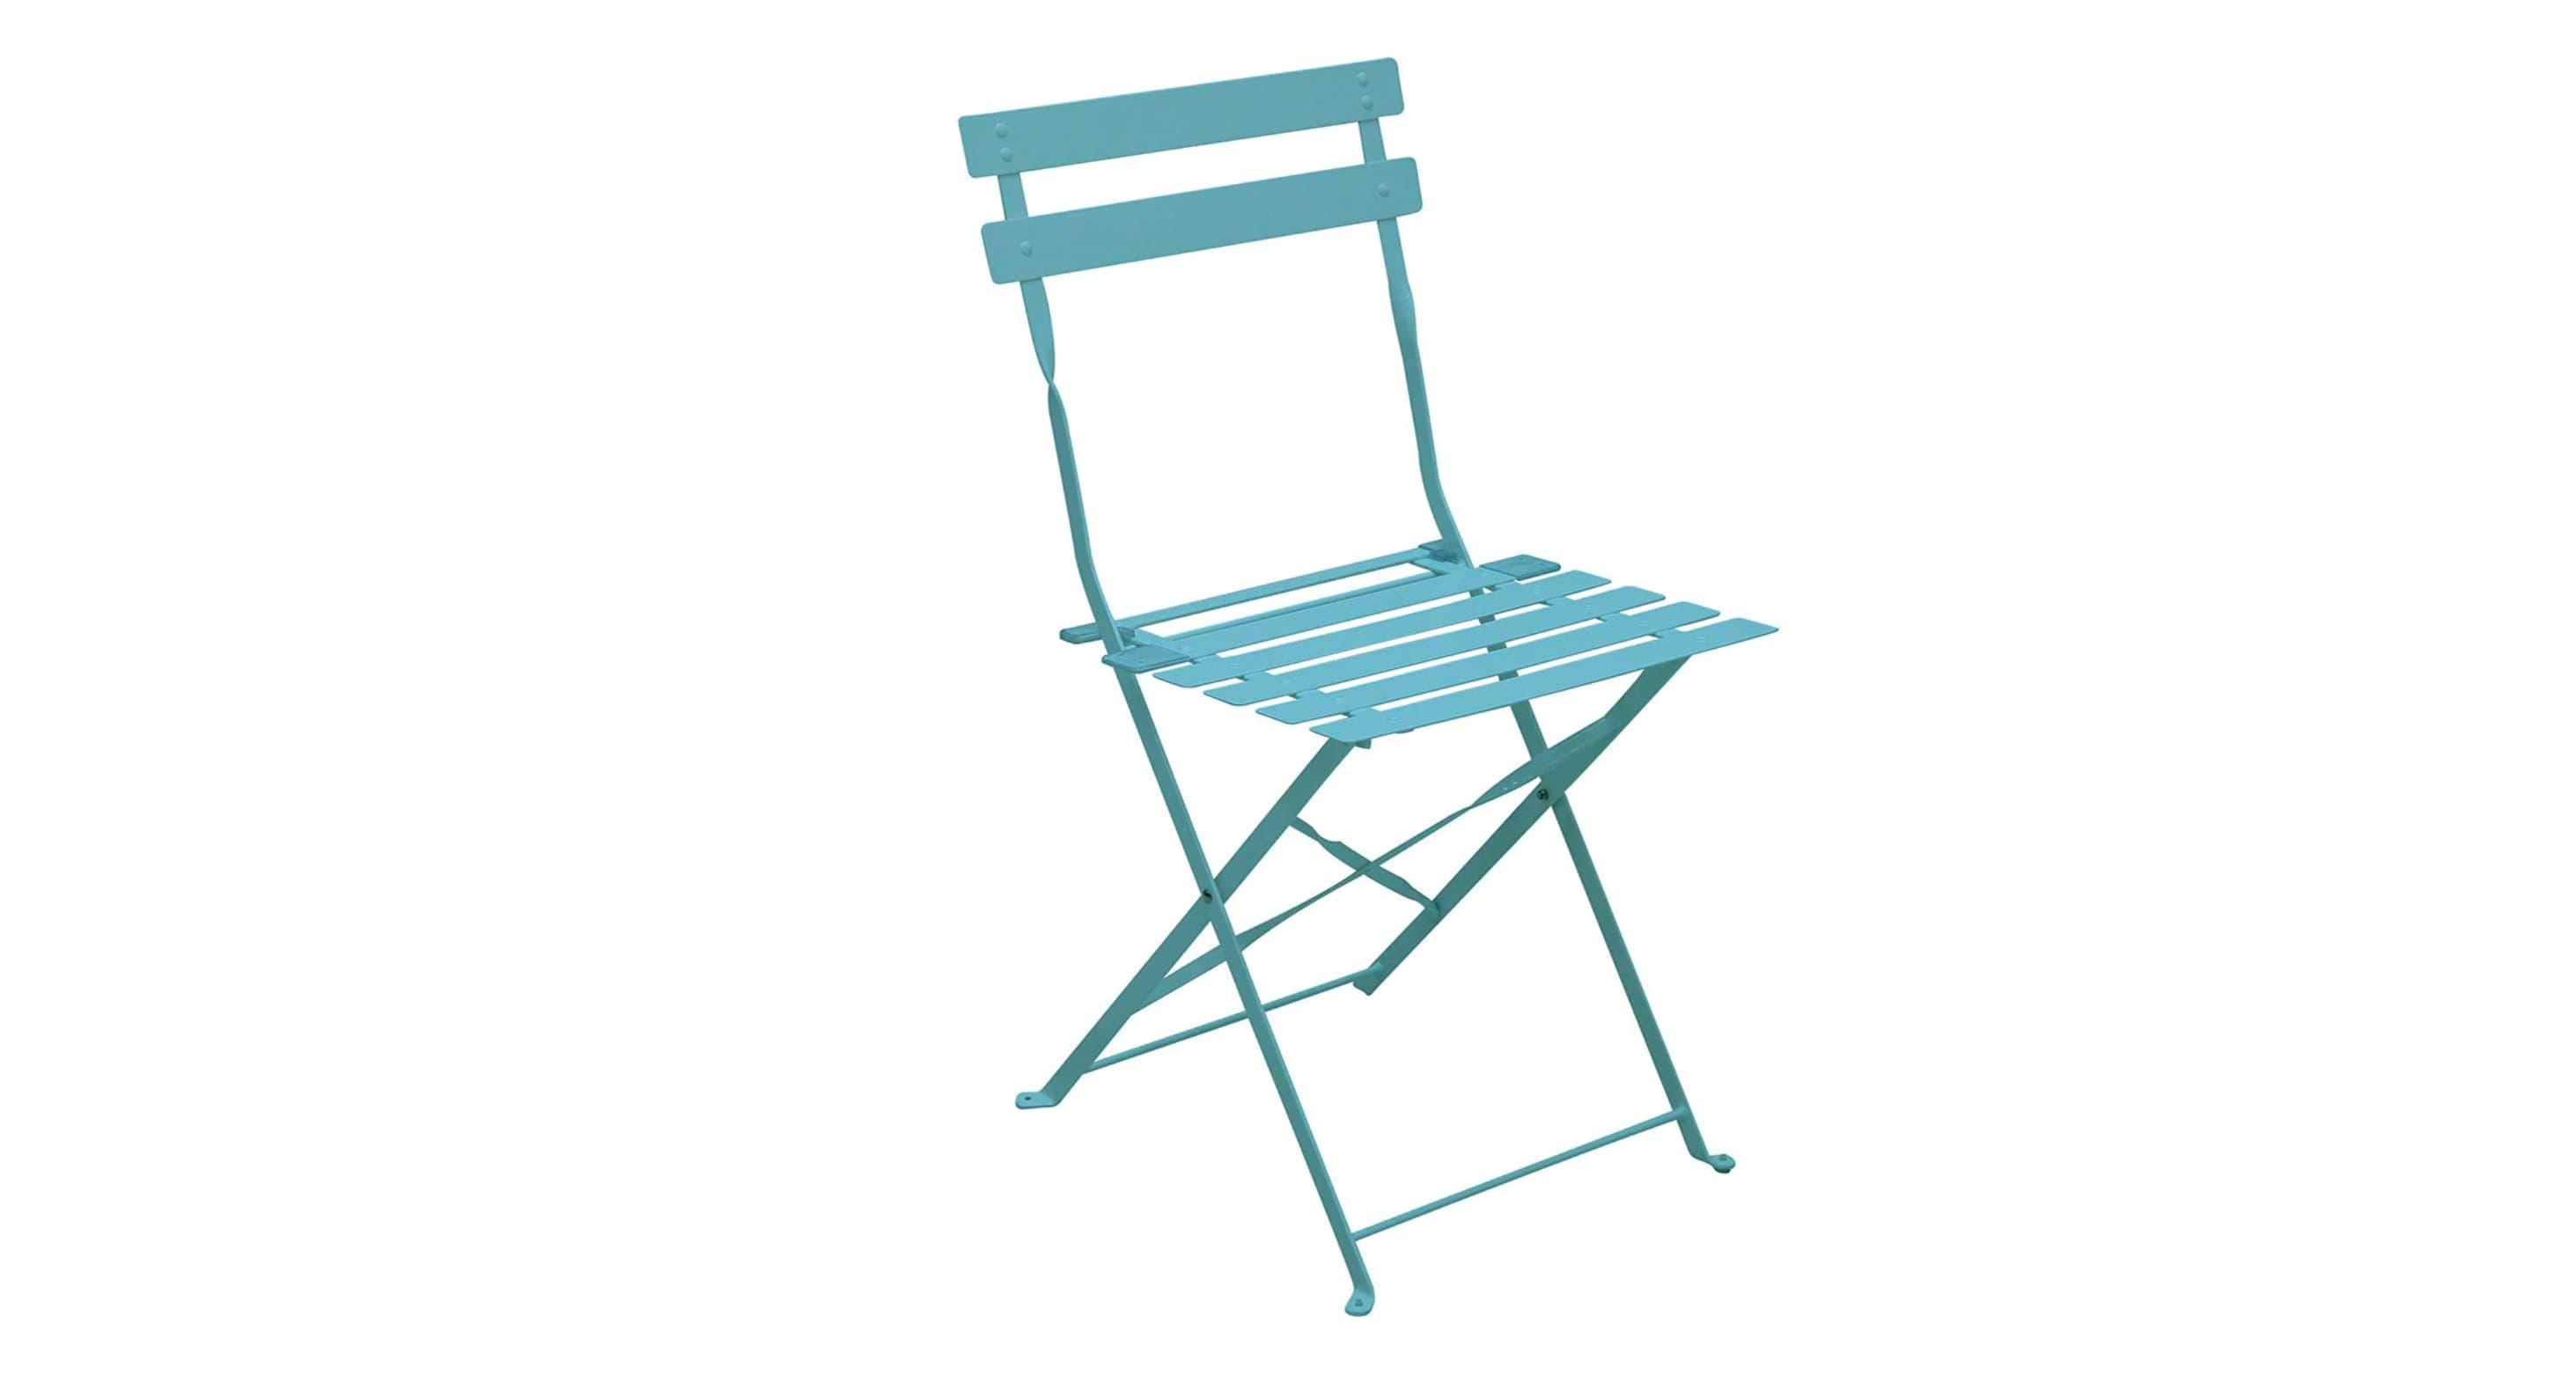 Set de 2 sillas plegables Portobello El Corte Inglés